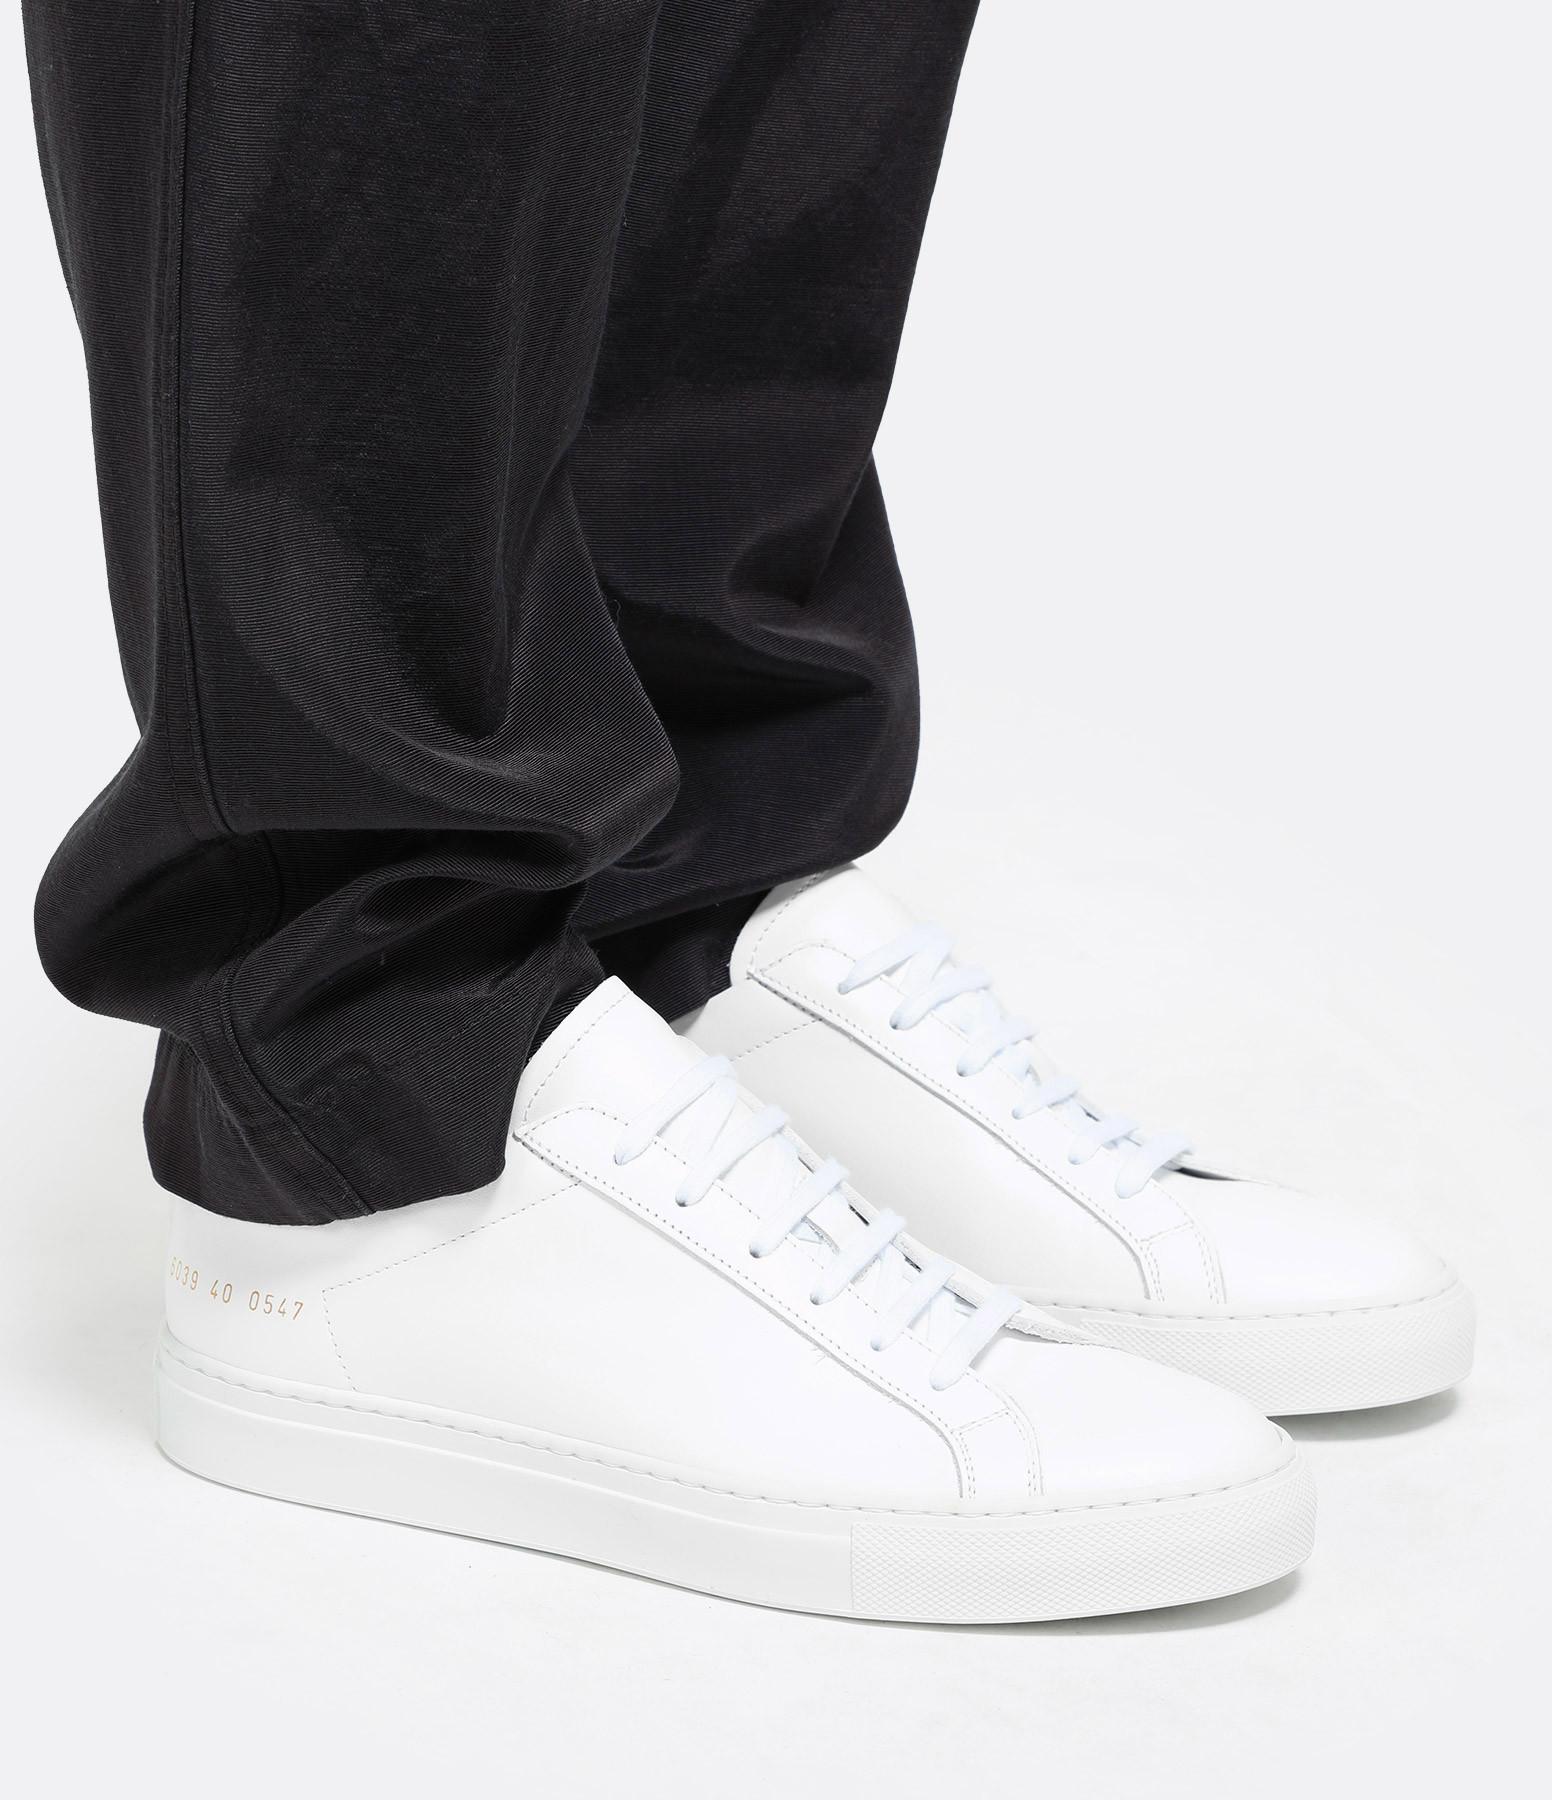 COMMON PROJECTS - Baskets Retro Low Cuir Blanc Noir